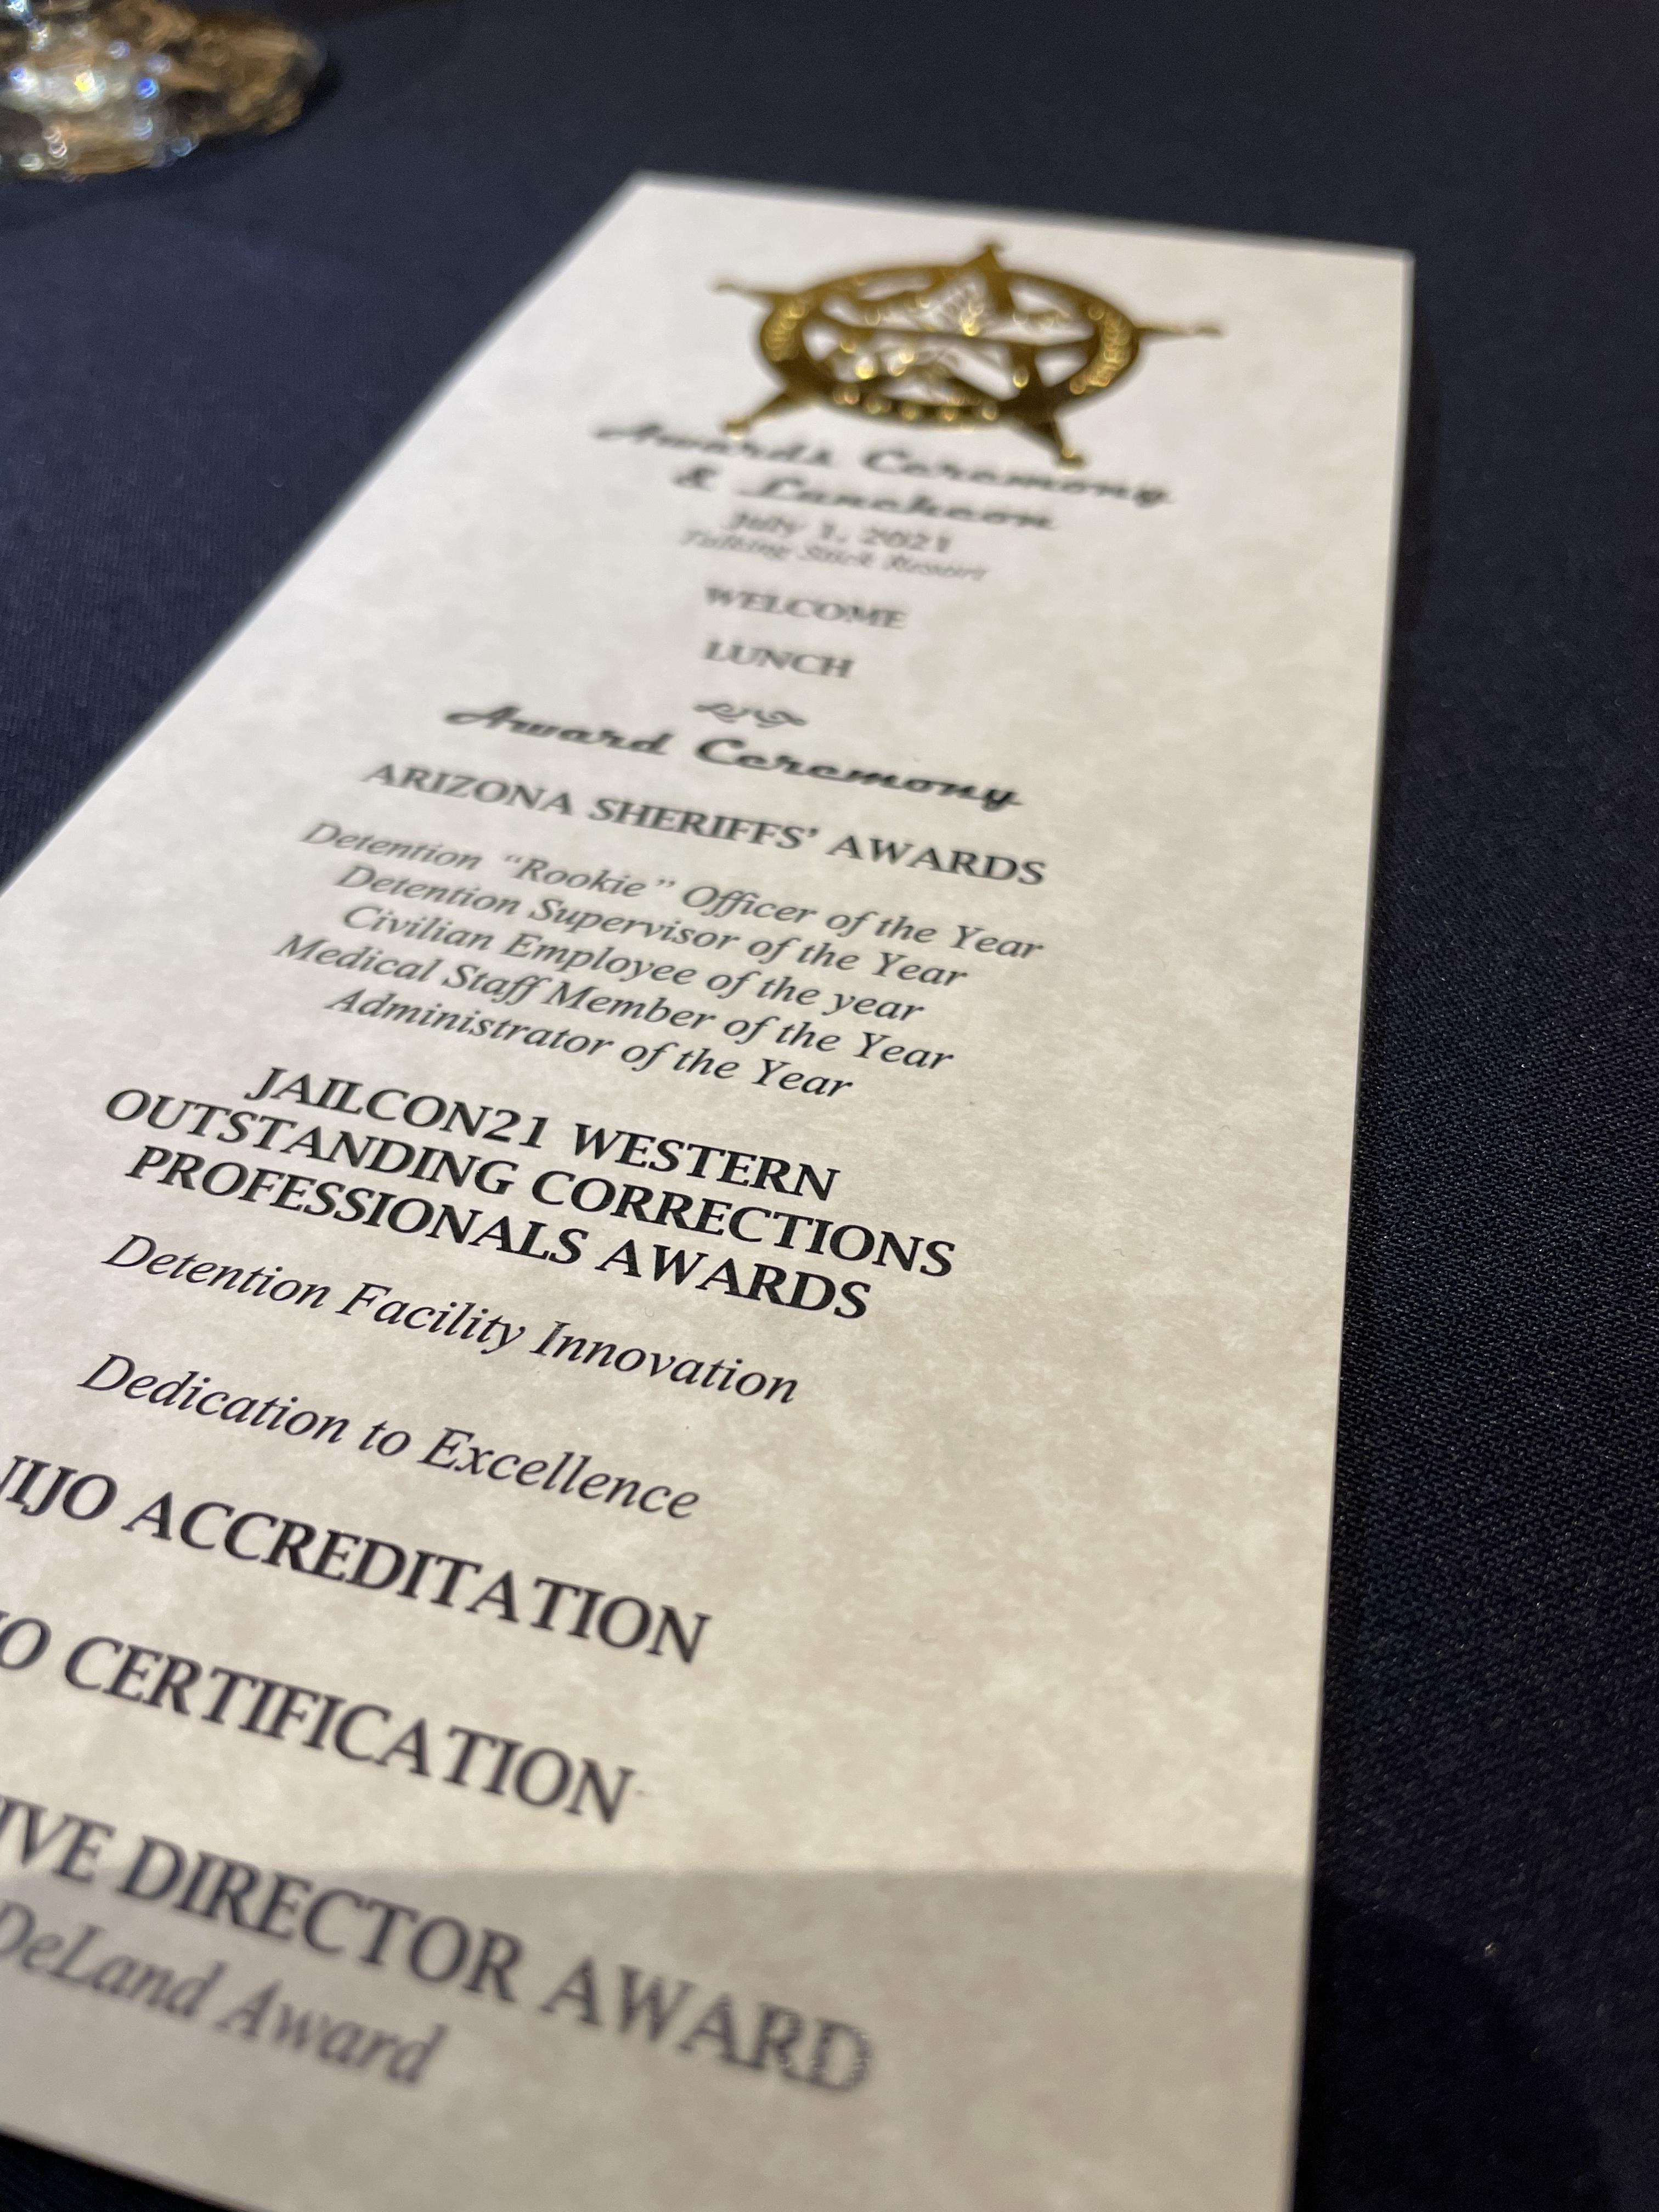 JAILCON21 Western Region Corrections Professionals Awards